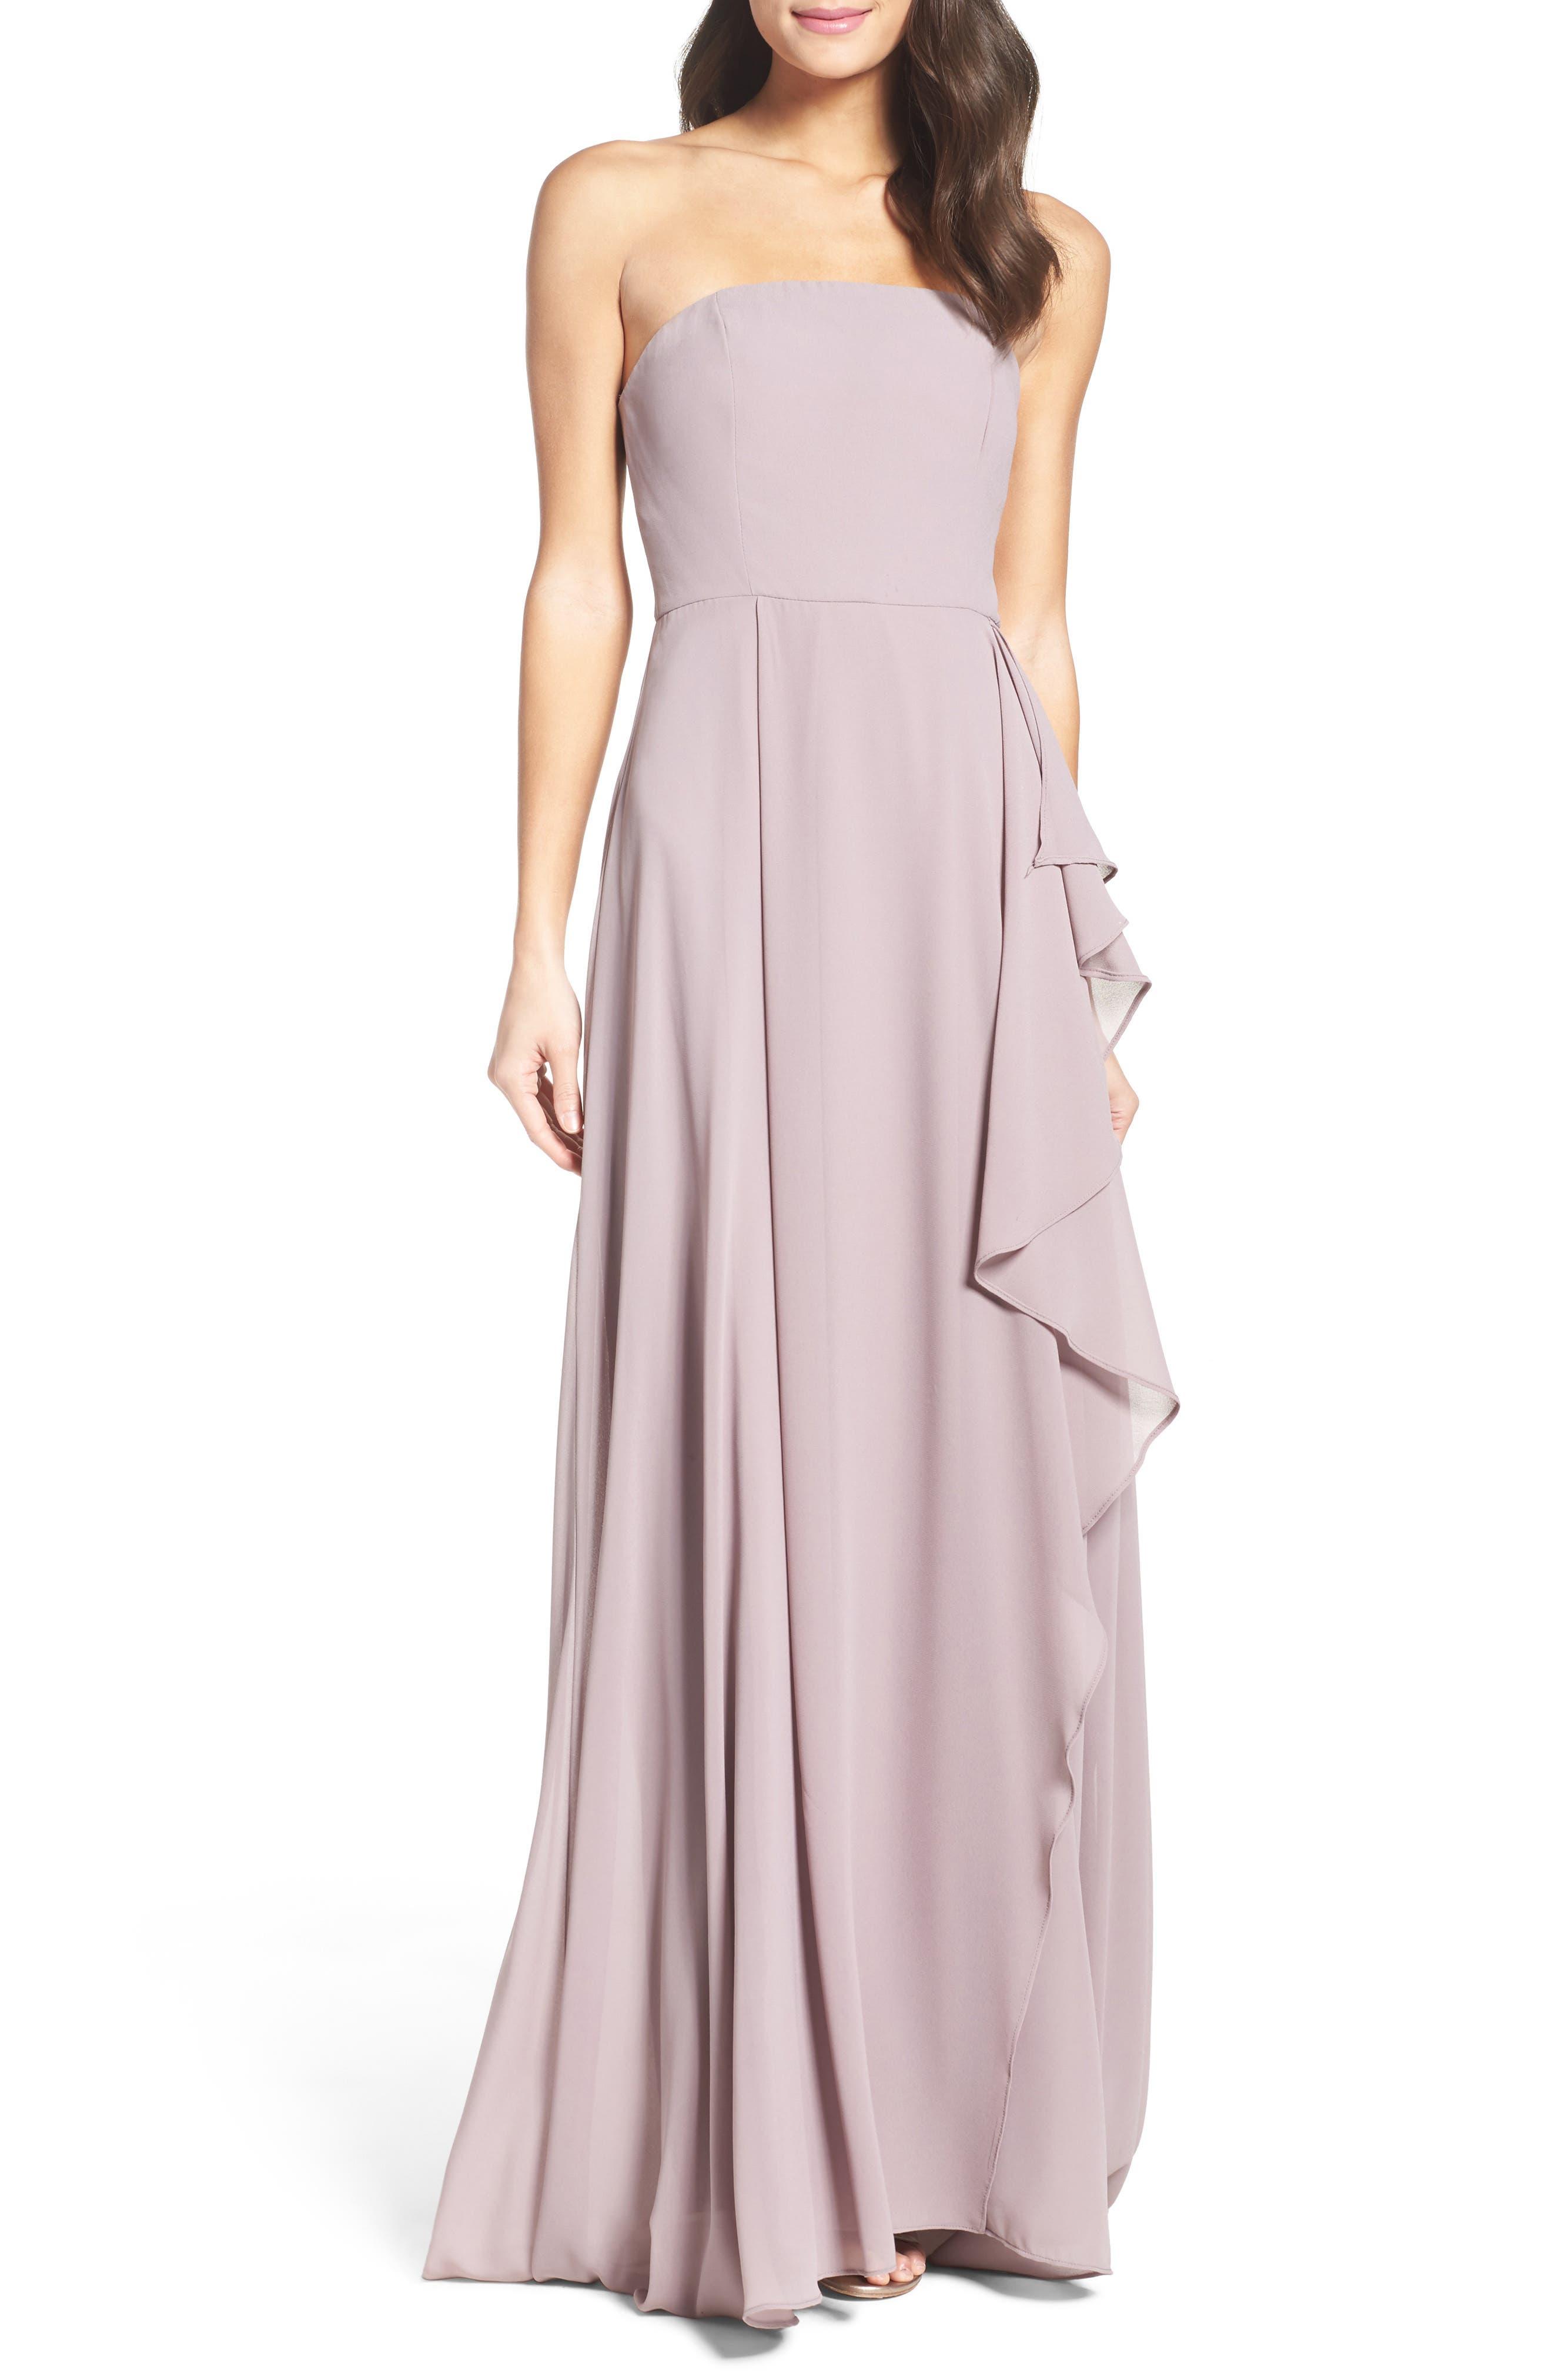 Chiffon Strapless Maxi Dress,                             Main thumbnail 1, color,                             020